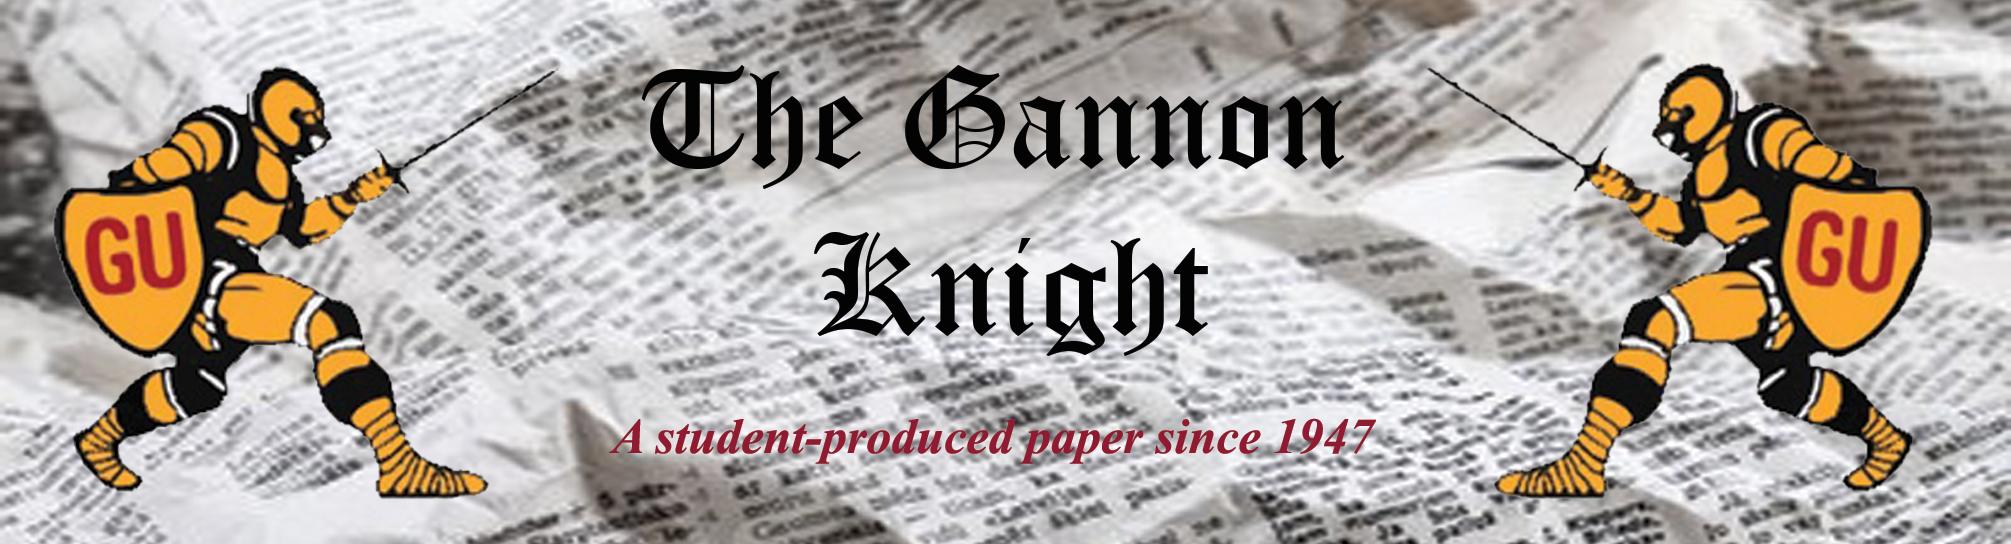 The Gannon Knight